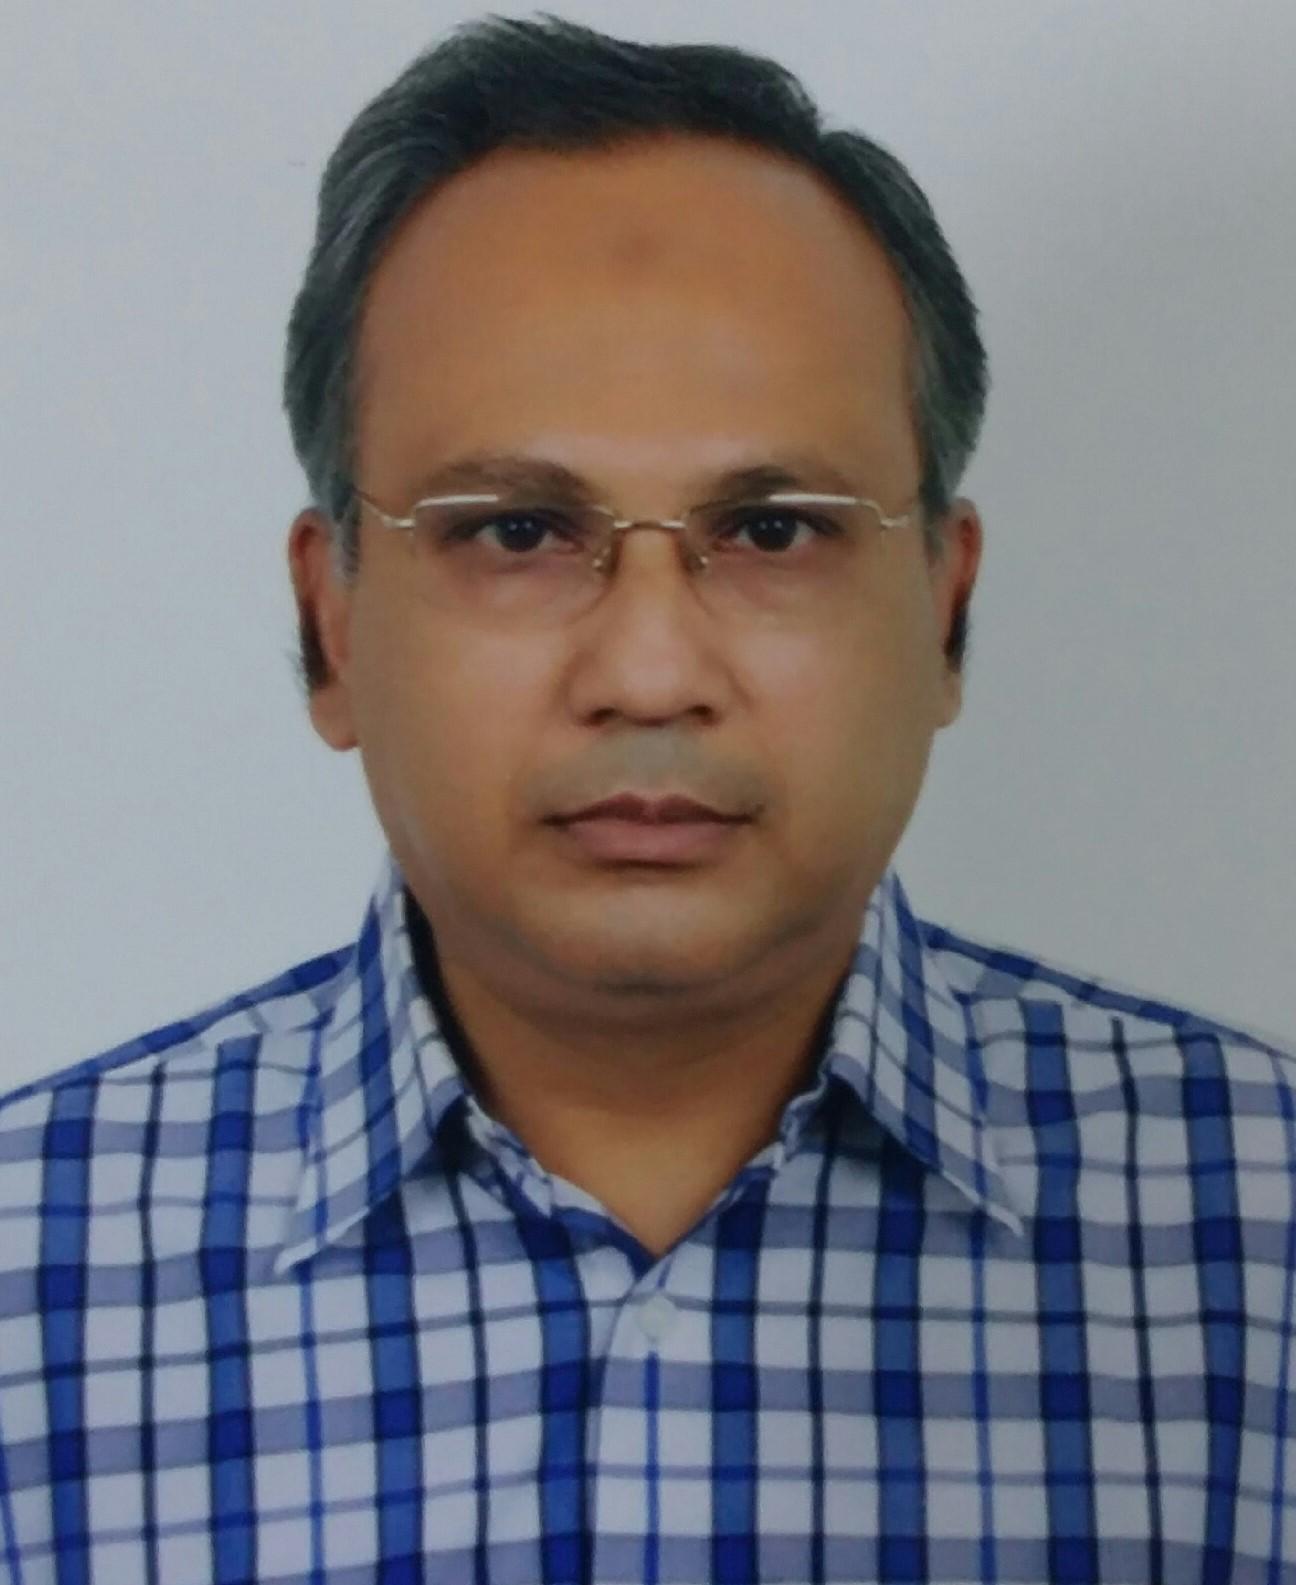 MOHAMMAD FAZLUL KADER BHUIYAN